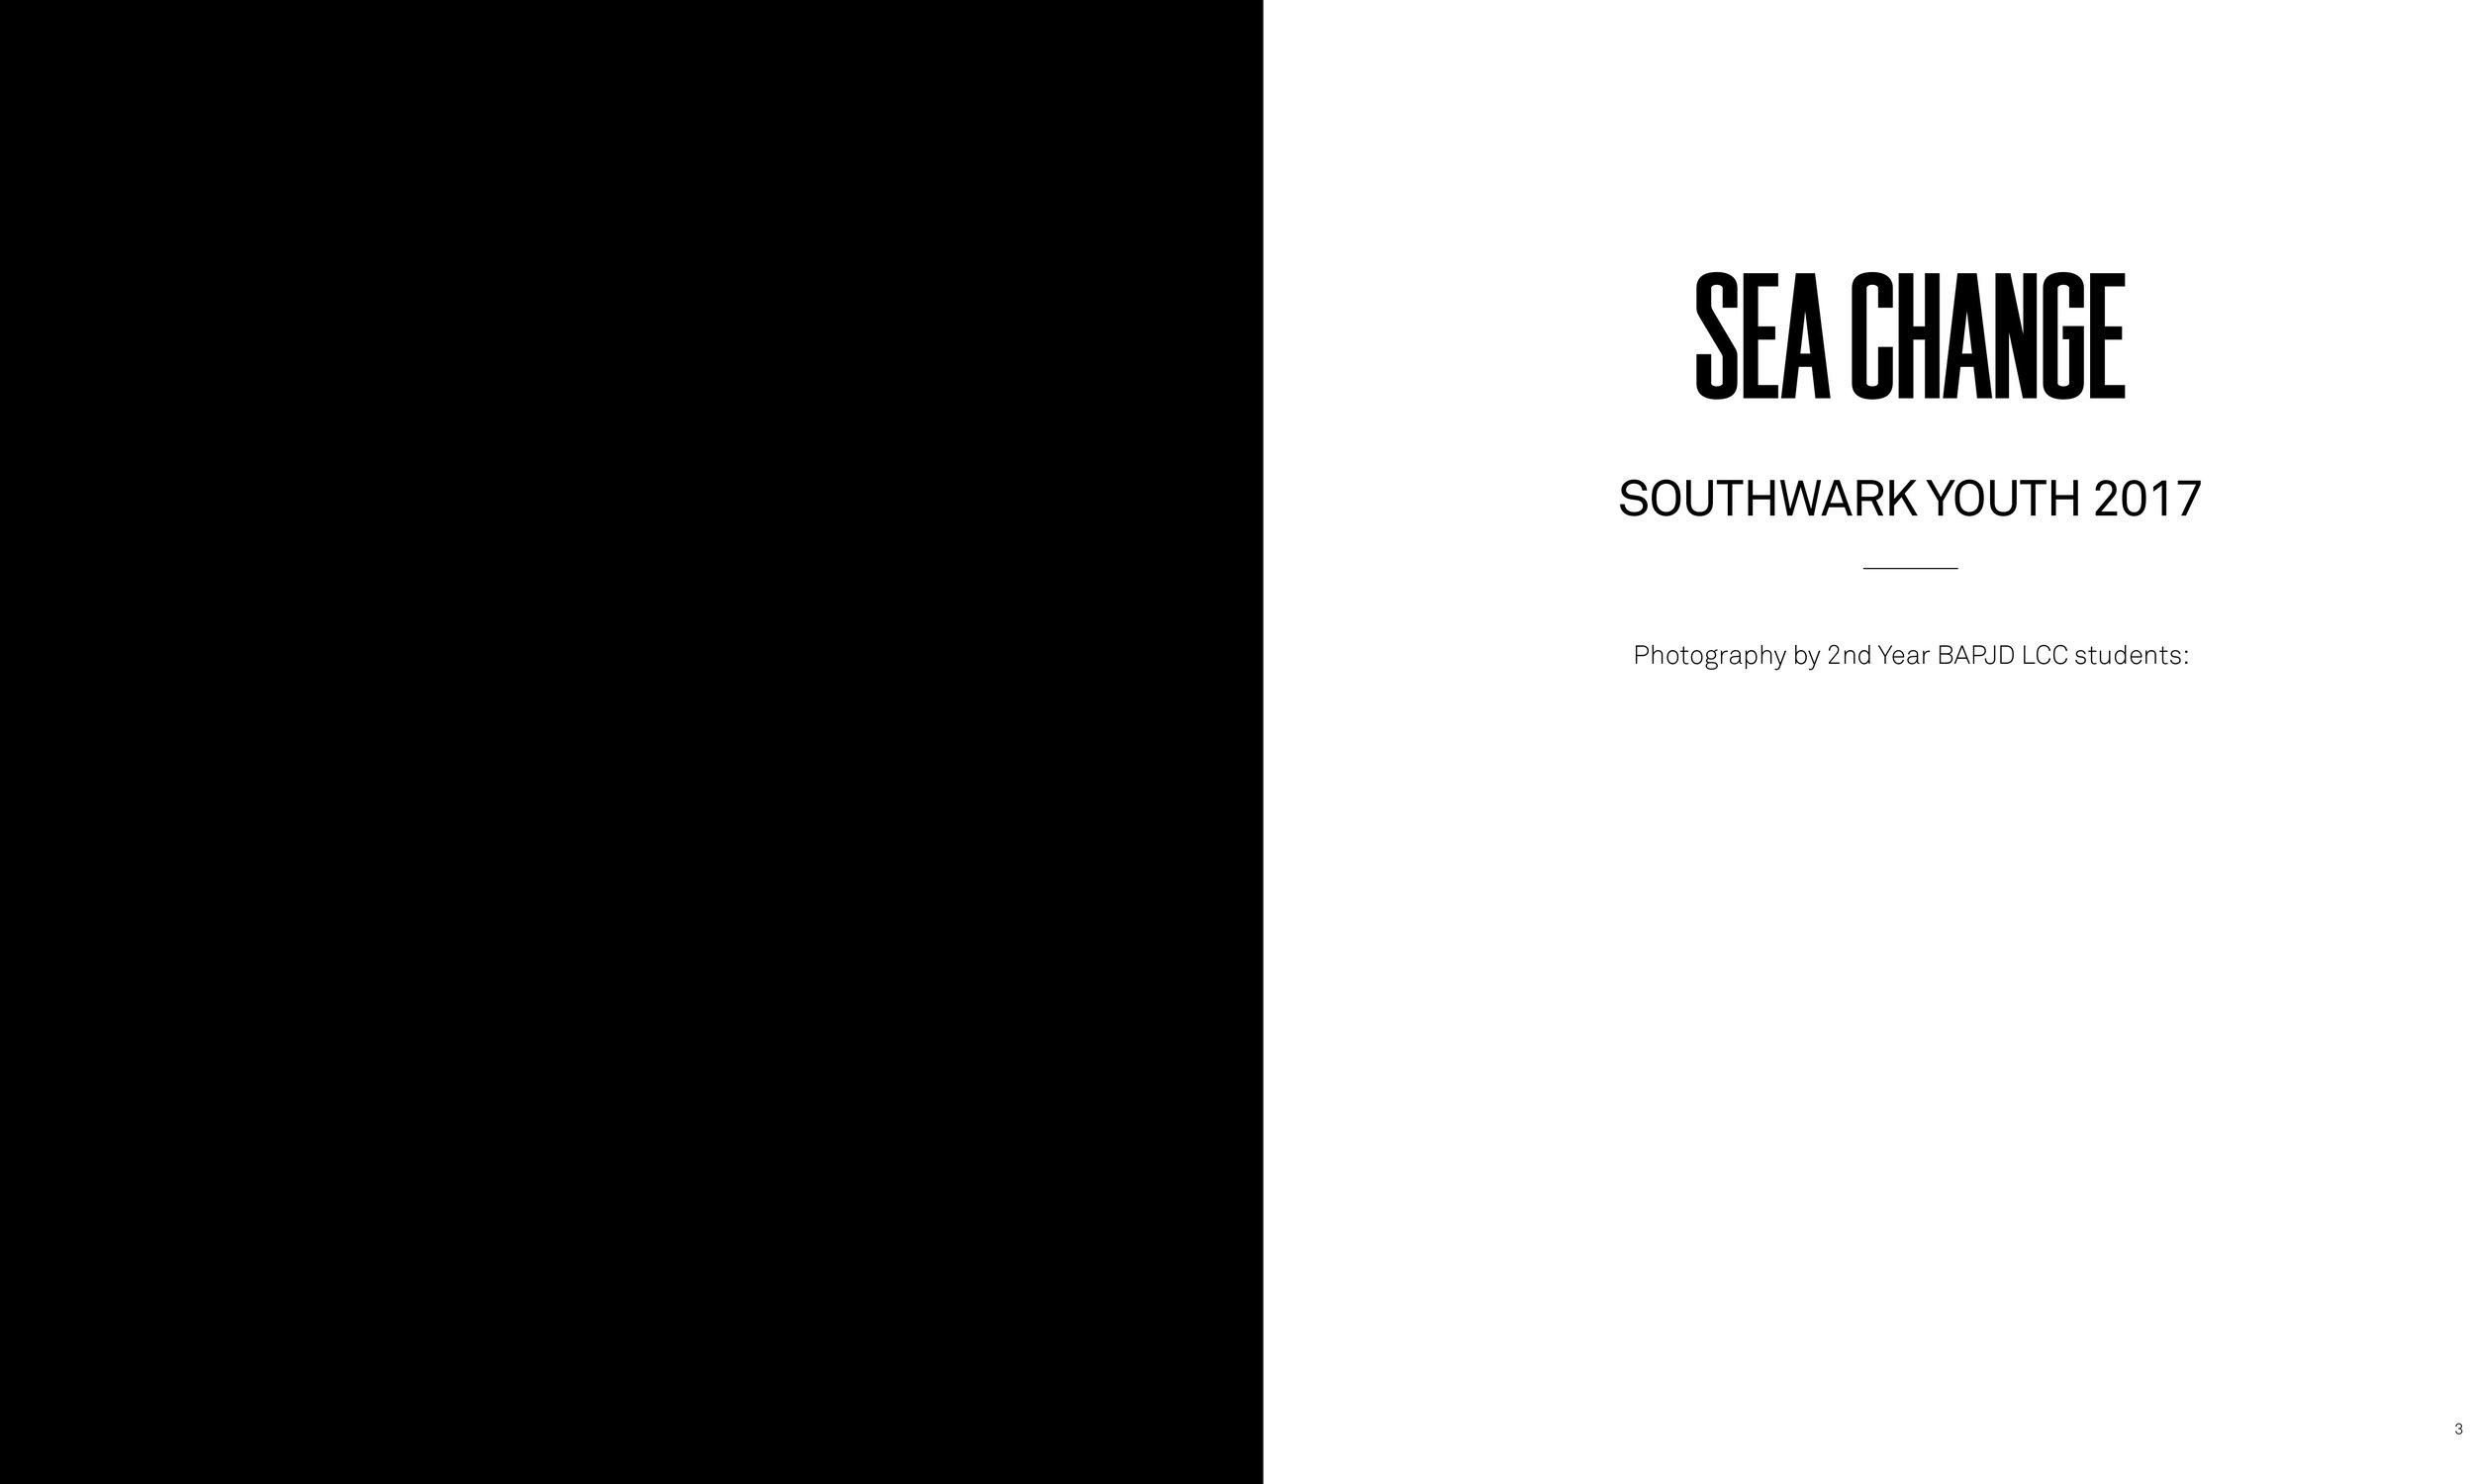 Sea Change Southwark Youth by LCC 2017-2 kopi.jpg